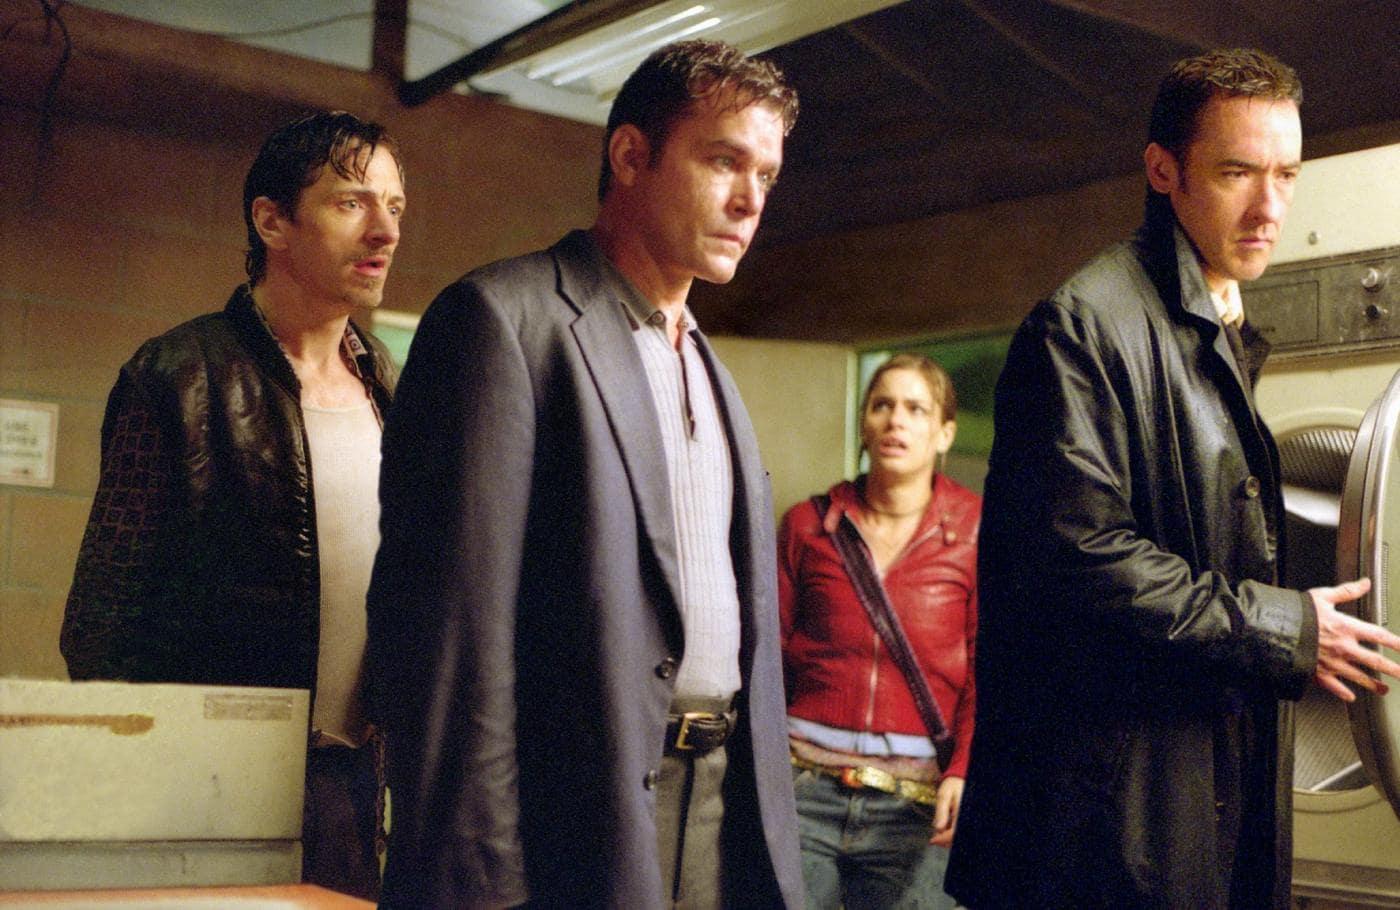 John Hawkes, Ray Liotta, Amanda Peet and John Cusack in Identity (2003)